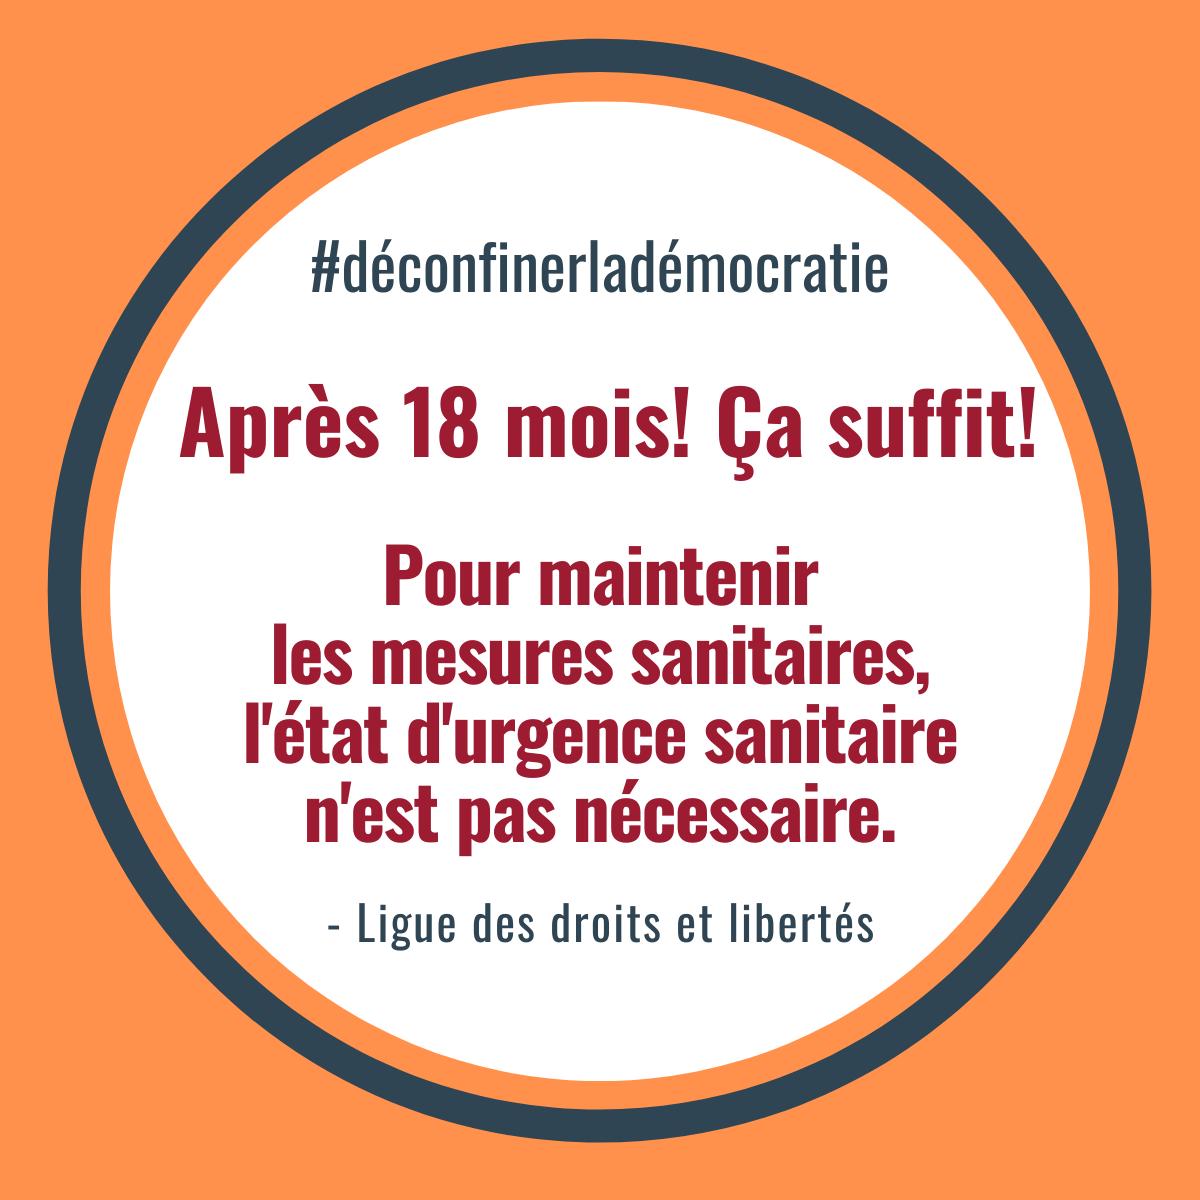 Deconfiner_democratie_FB_fil_actualite_1200x1200px_20210702